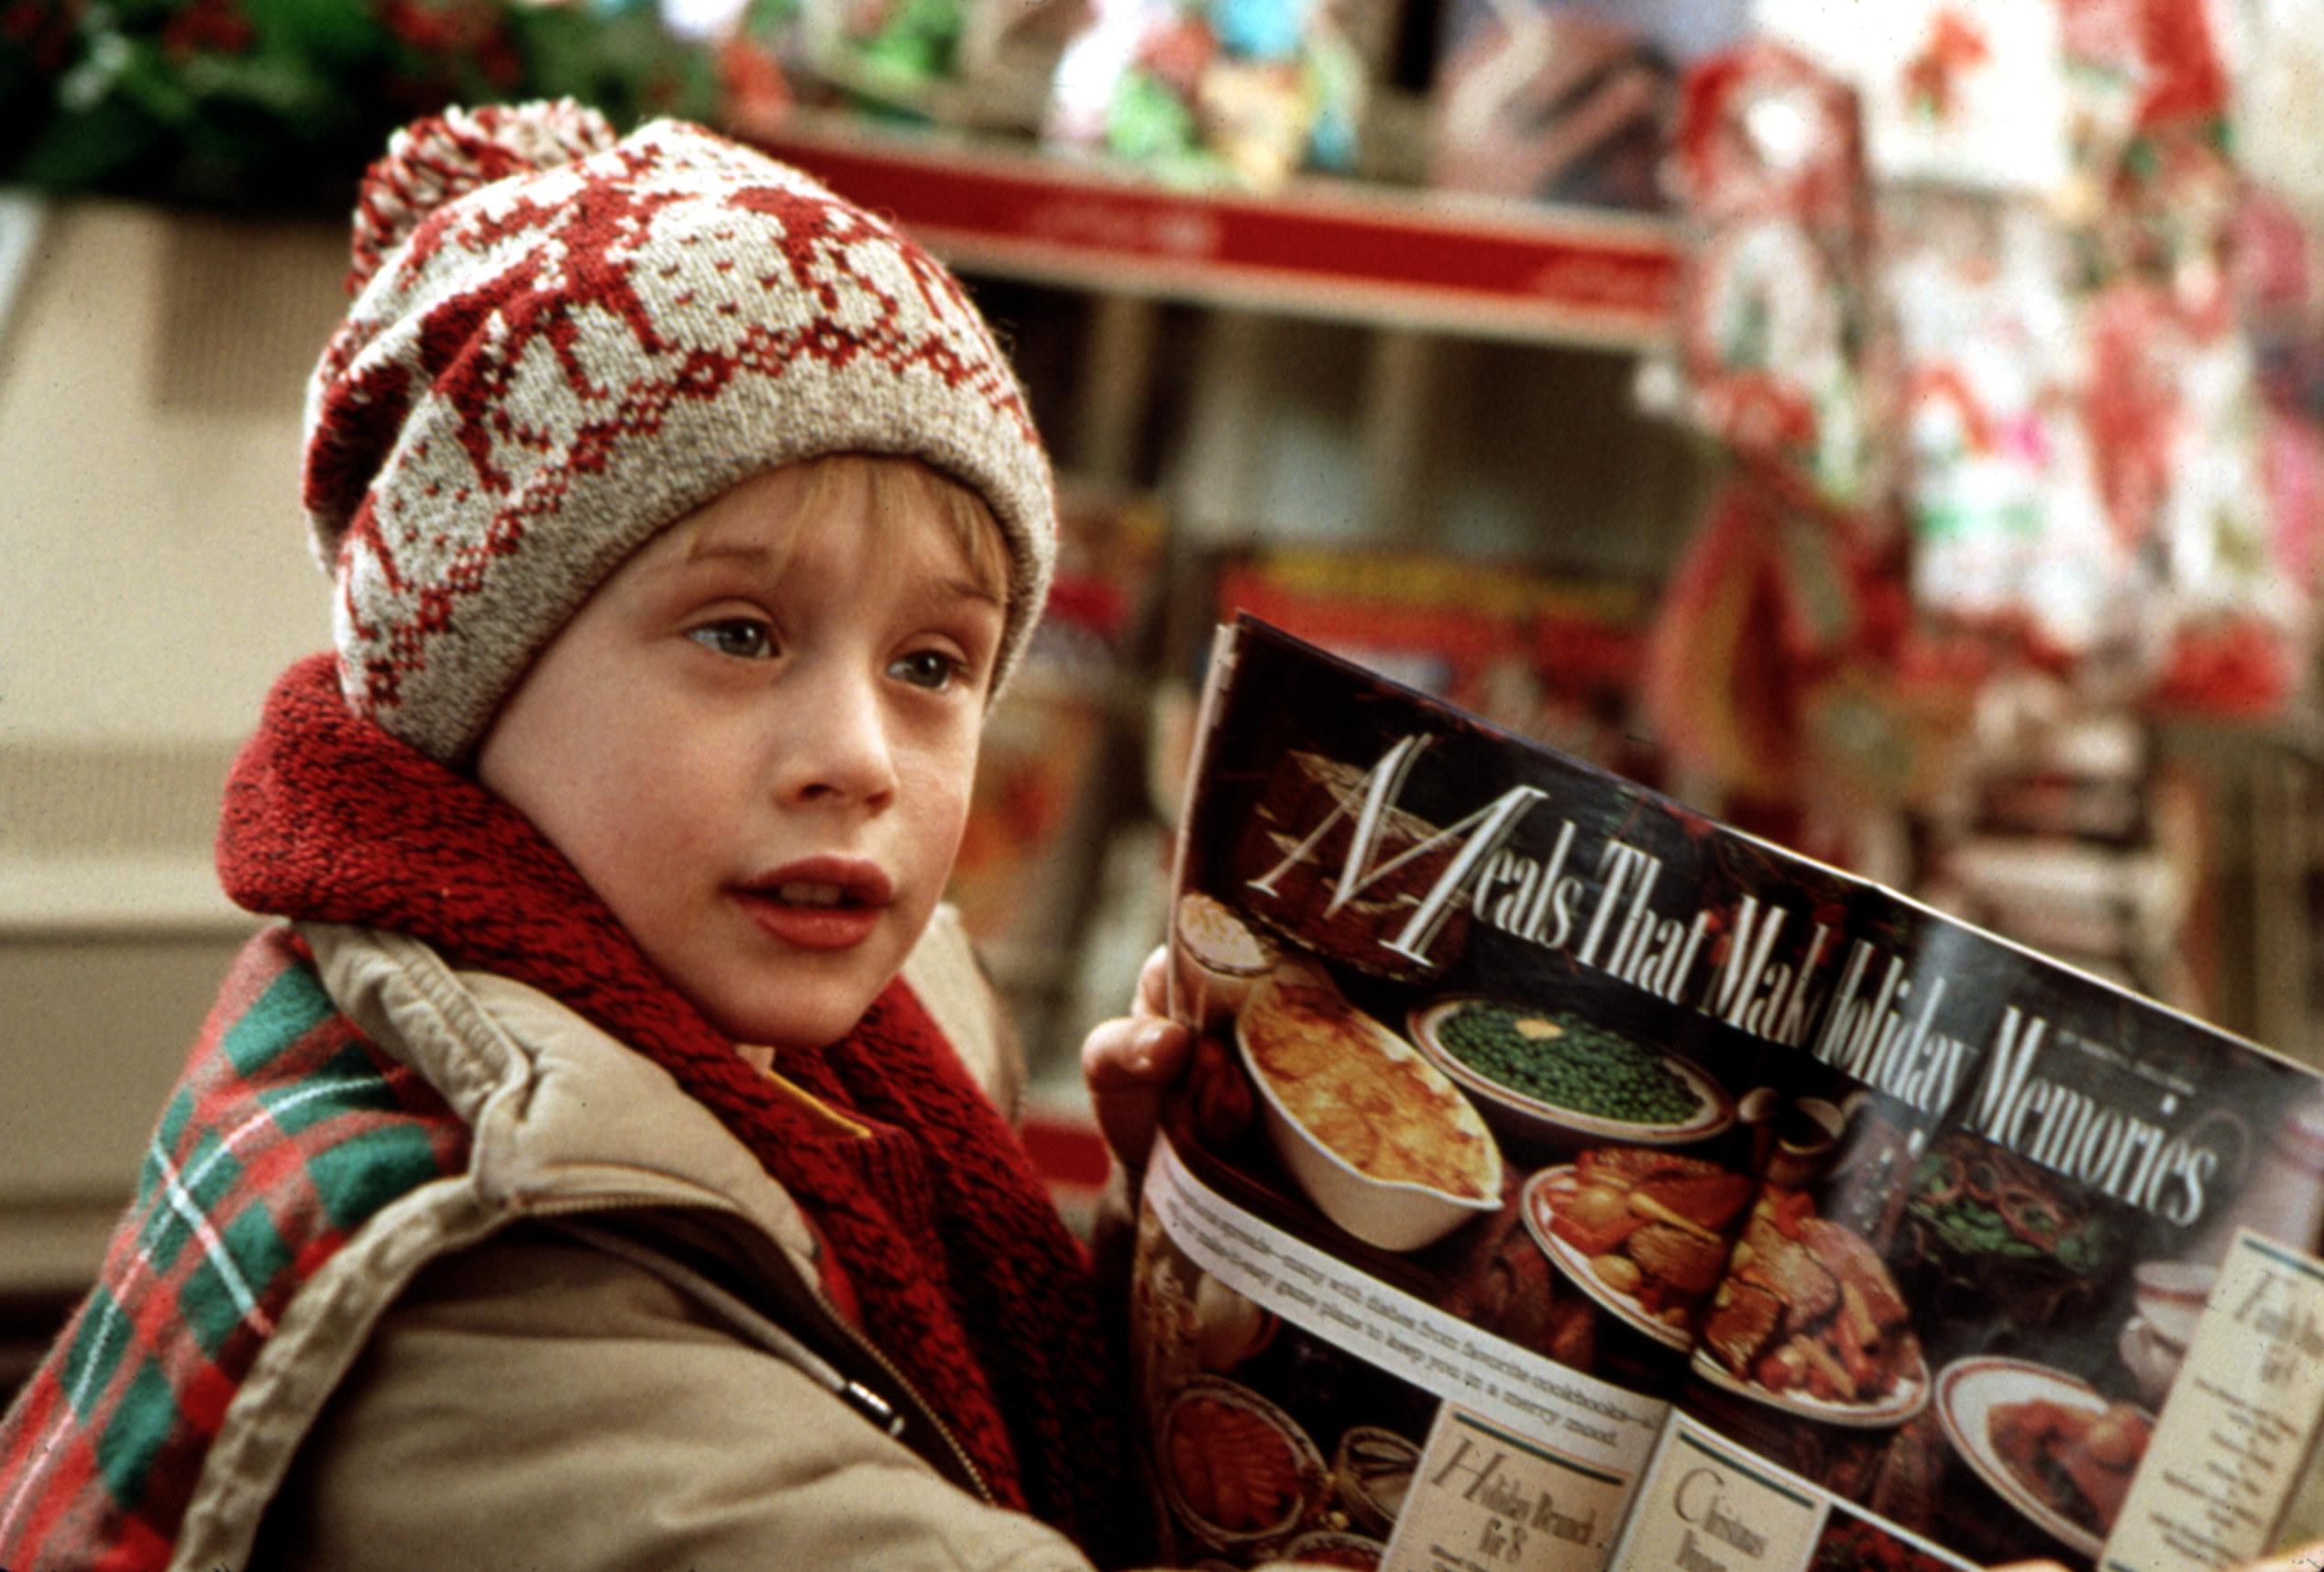 Macaulay Culkin looks at a magazine at a supermarket